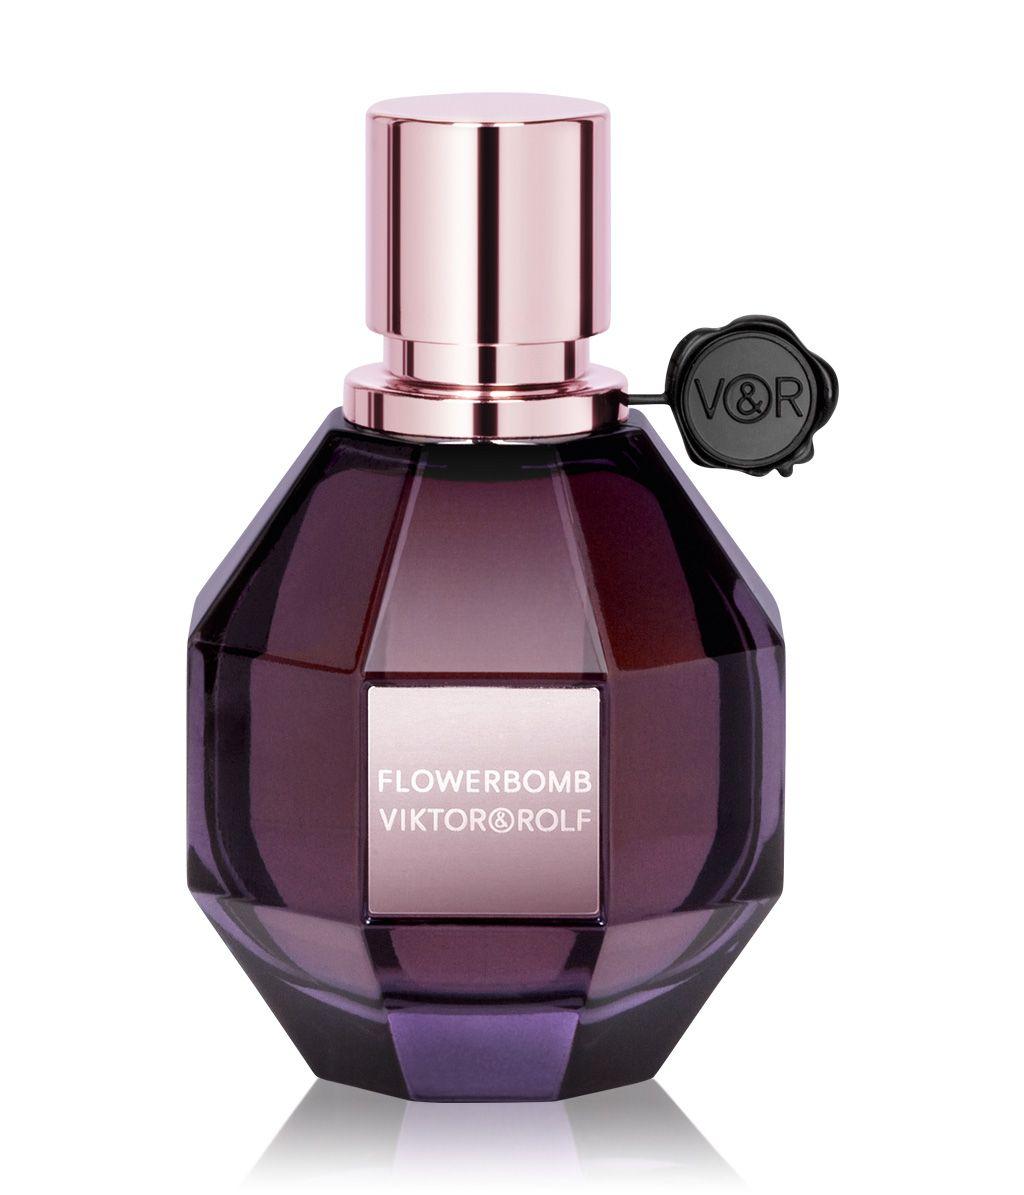 Viktor Rolf Flowerbomb Extreme Eau De Parfum 50 Ml 8295 Benim